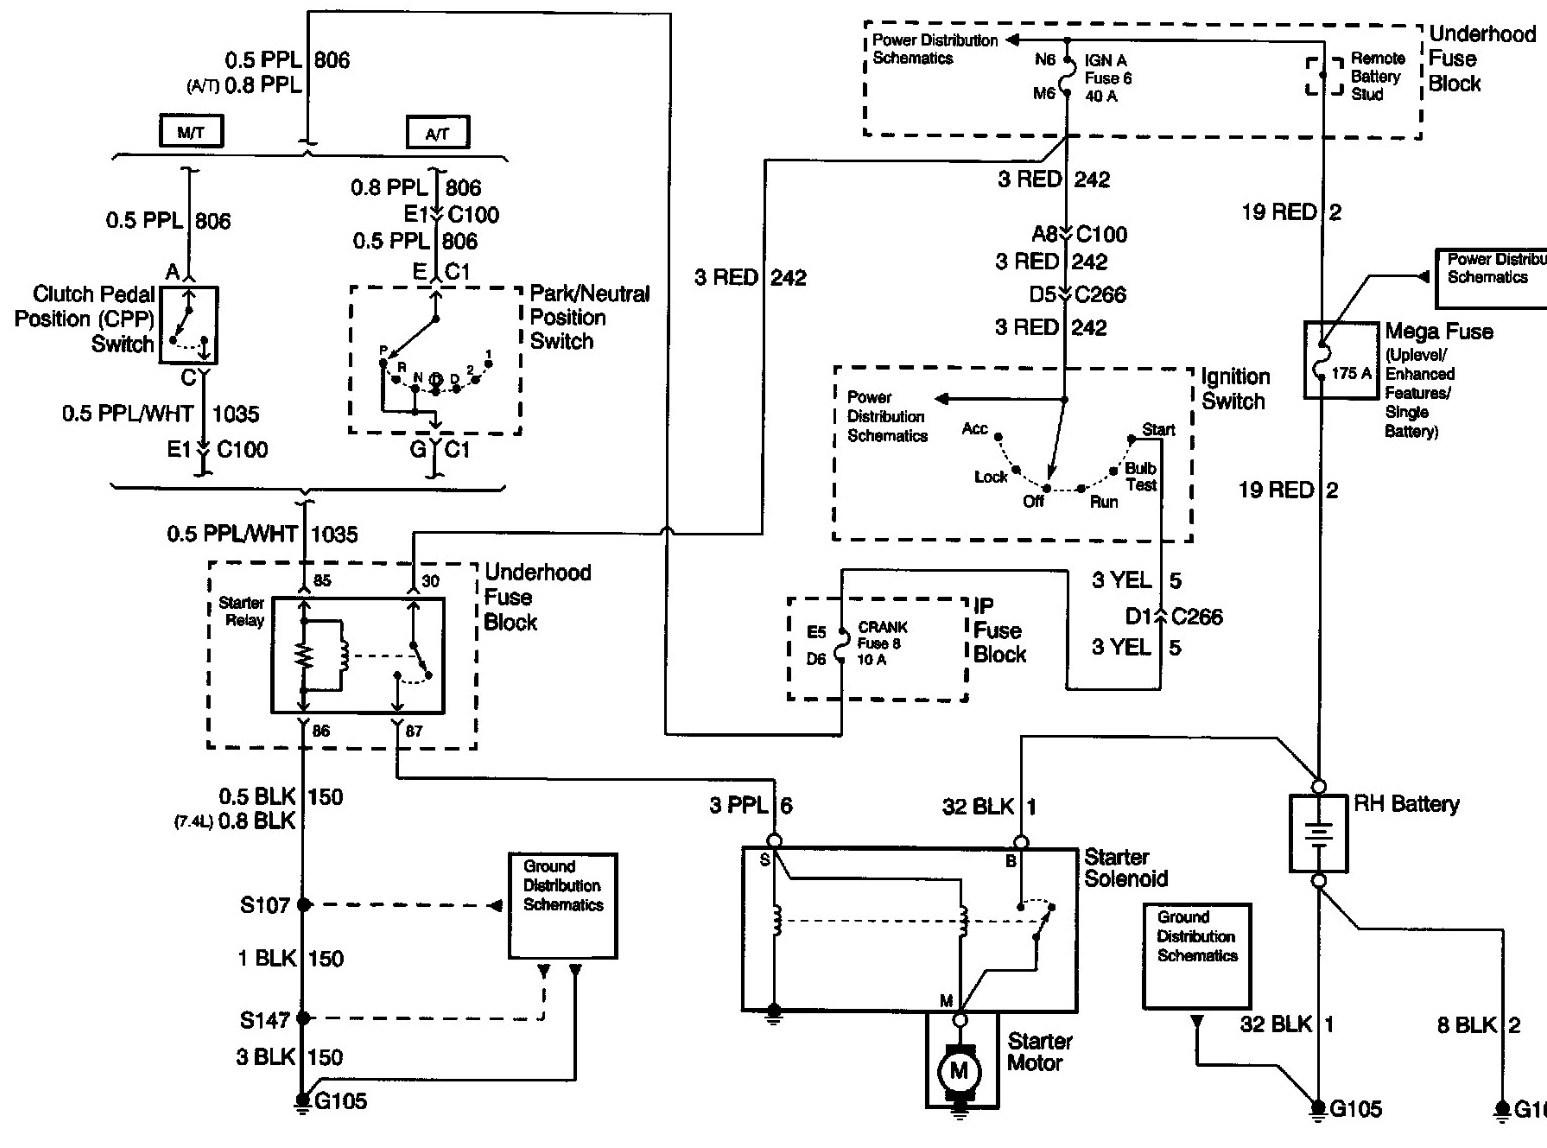 asco limit switch wiring diagram asco 918 wiring diagram | free wiring diagram asco 918 contactor wiring diagram #6